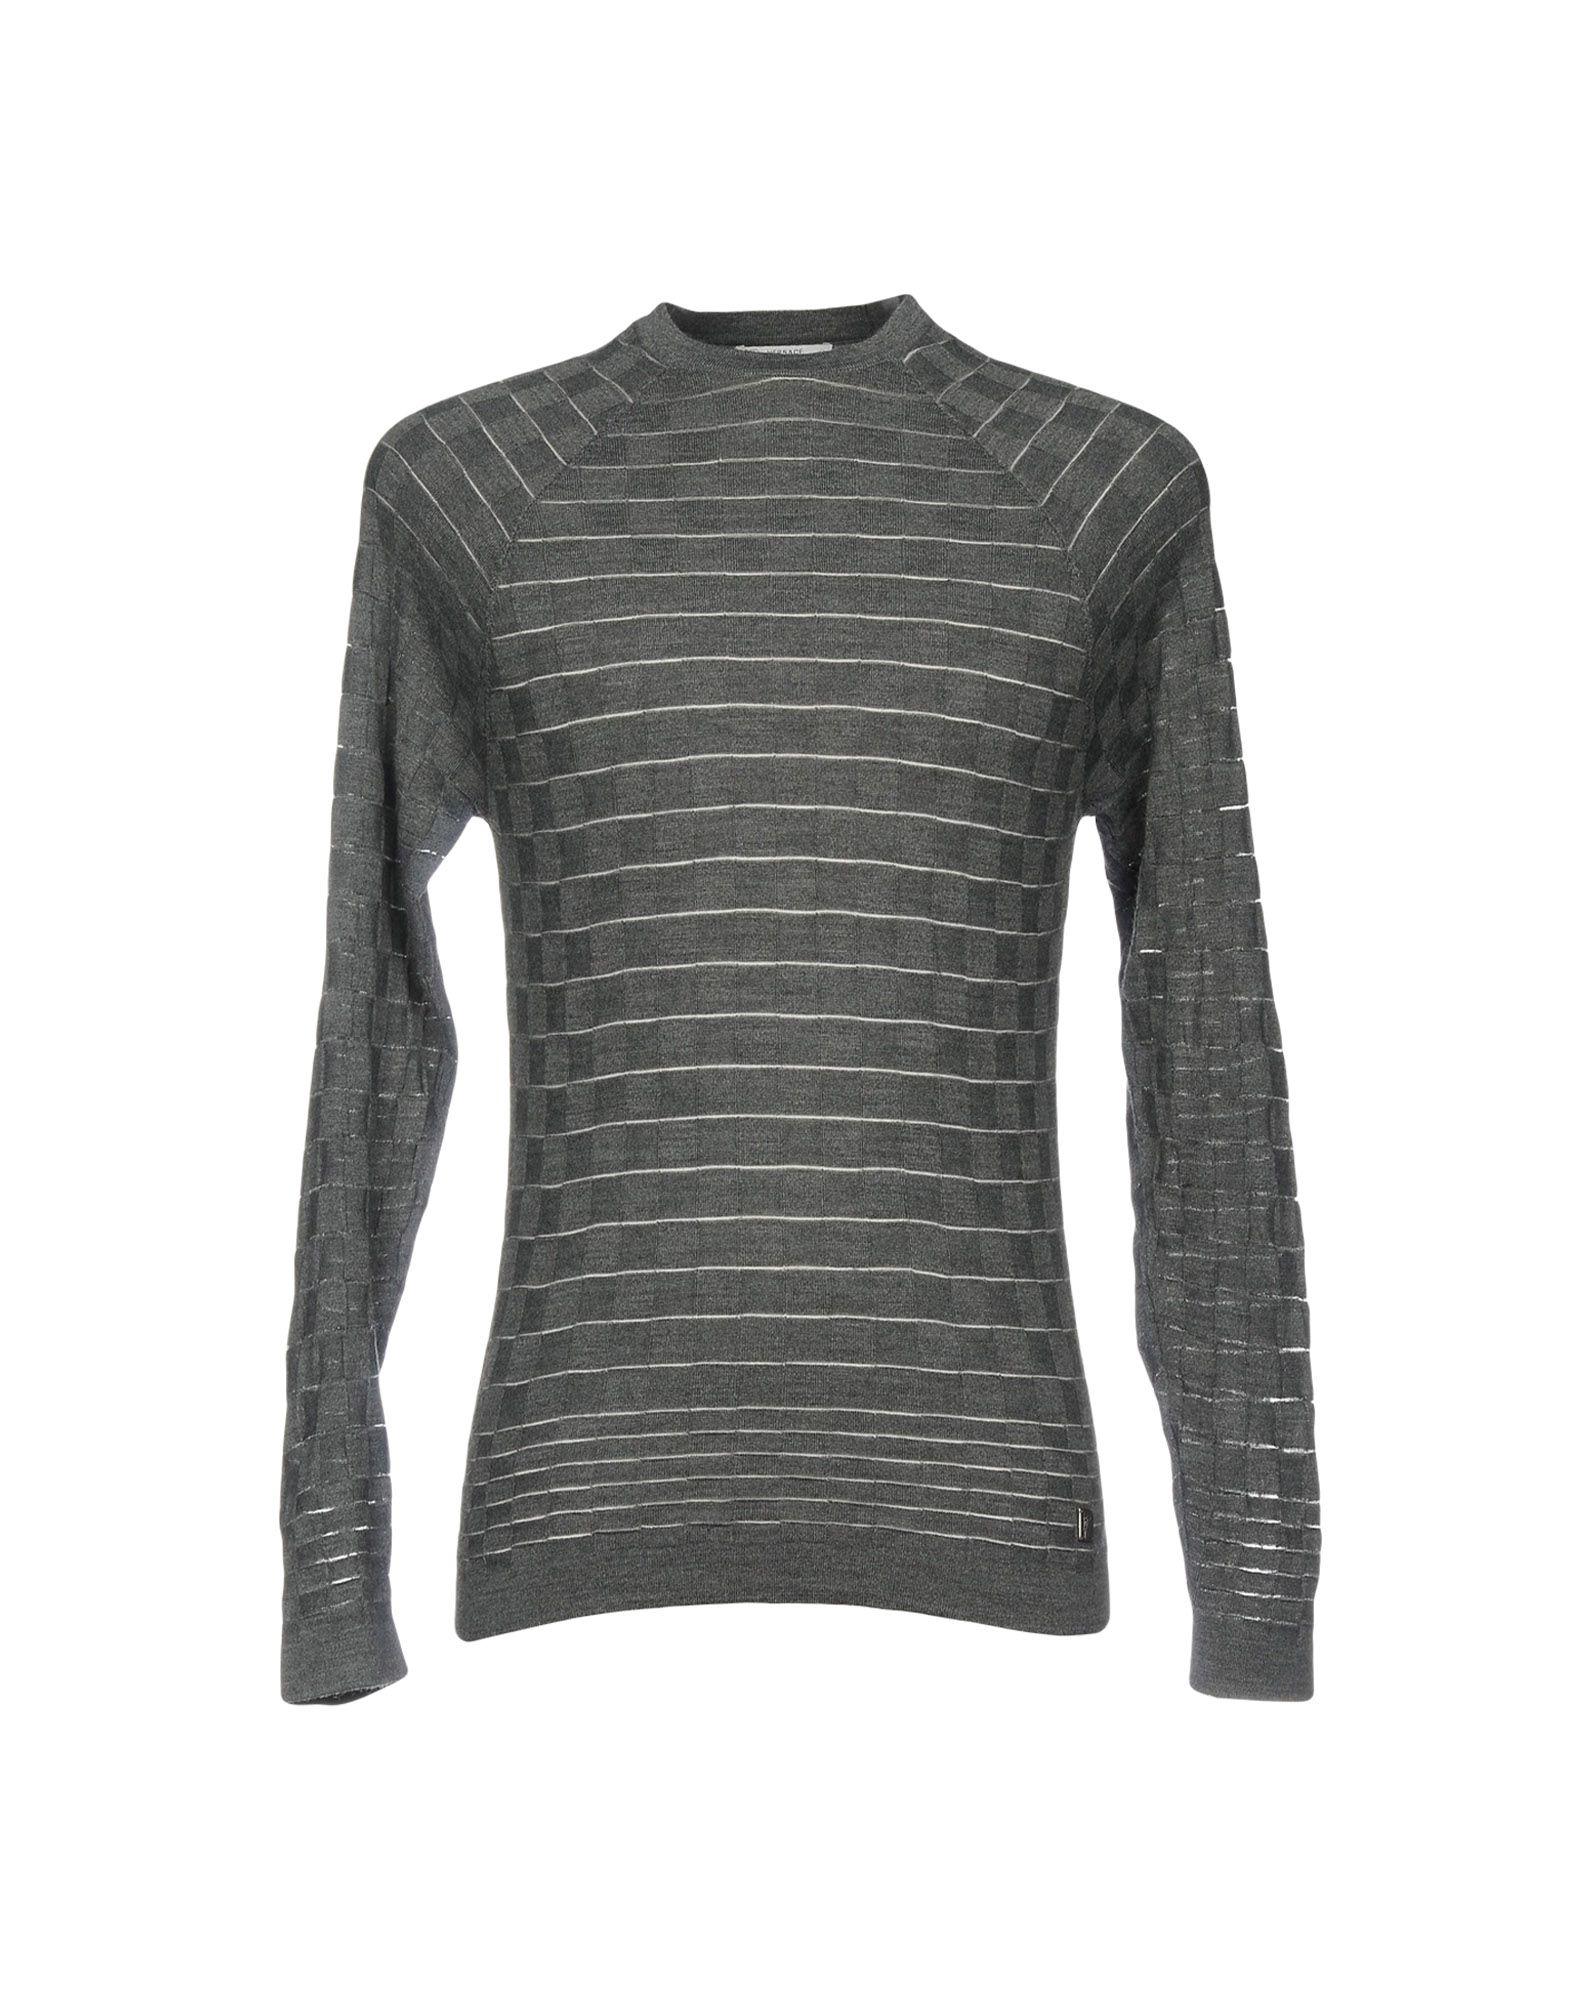 VERSACE COLLECTION Свитер свитер мужской versace 90130